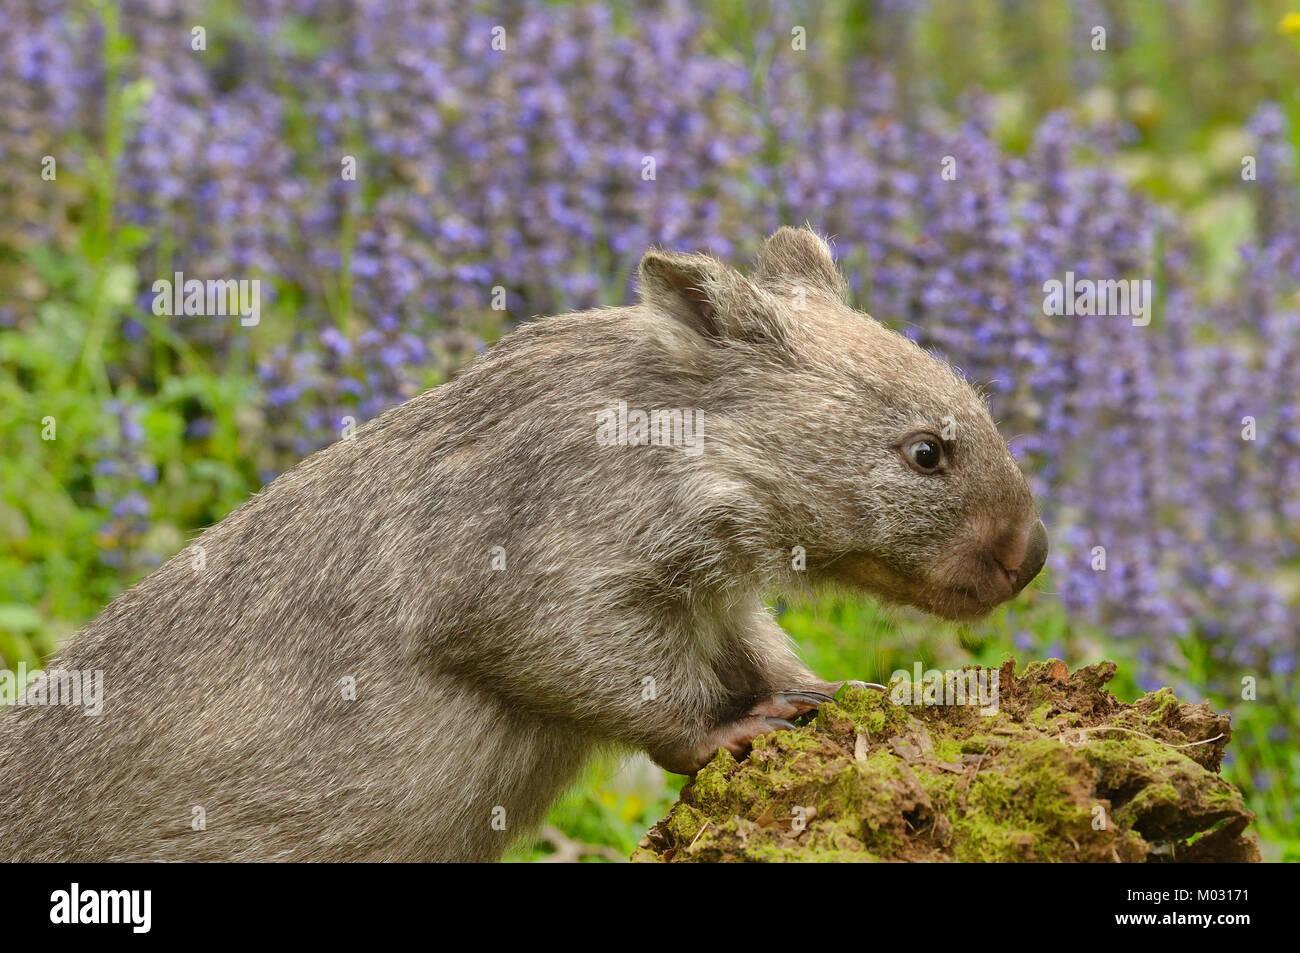 Common Wombat Vombatus ursinus Photographed in Tasmania, Australia Stock Photo